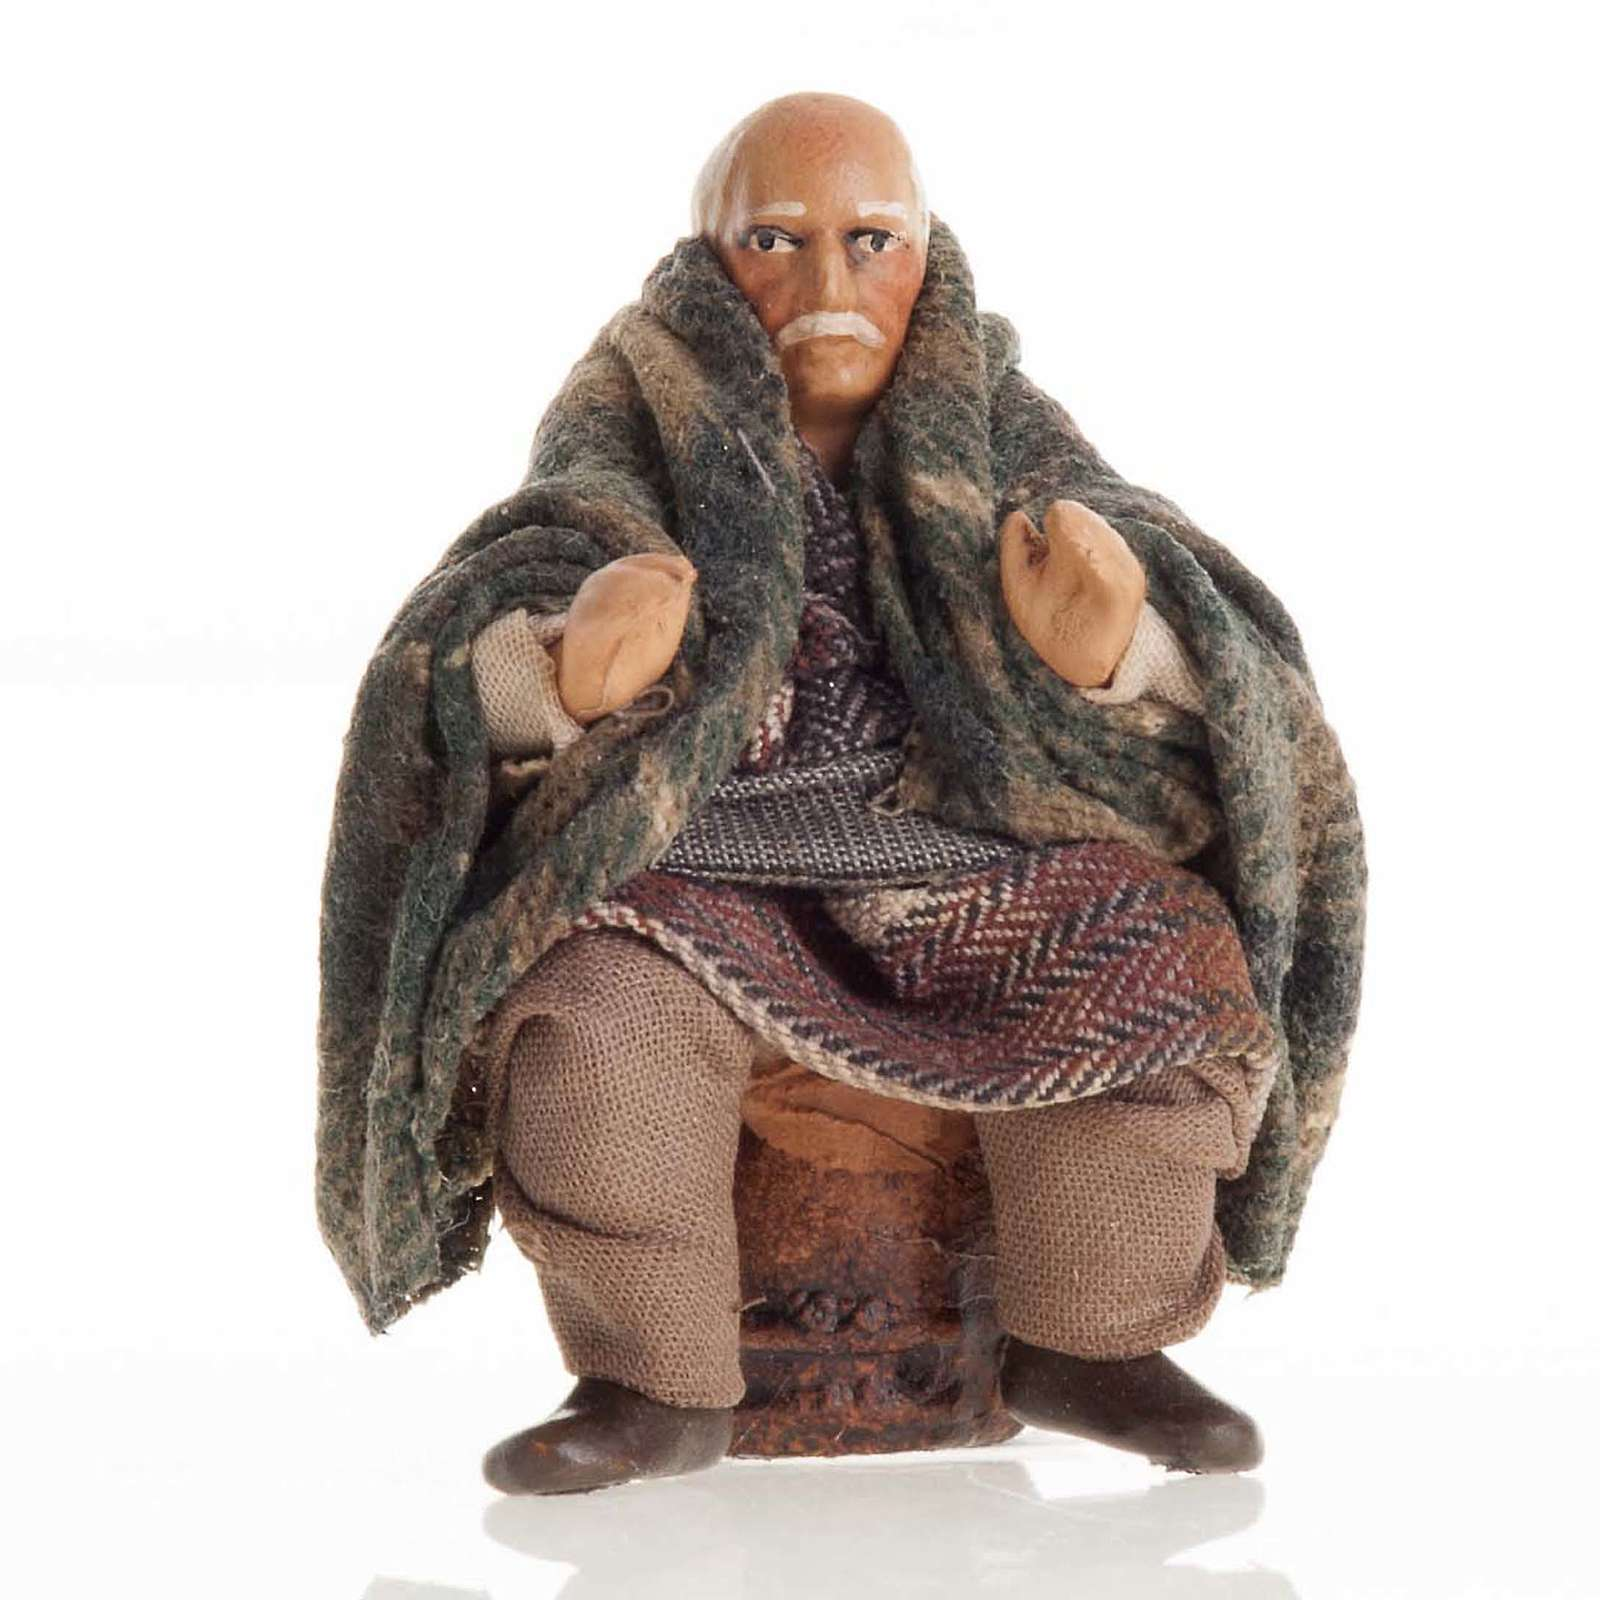 Neapolitan Nativity figurine, Old man 8cm 4